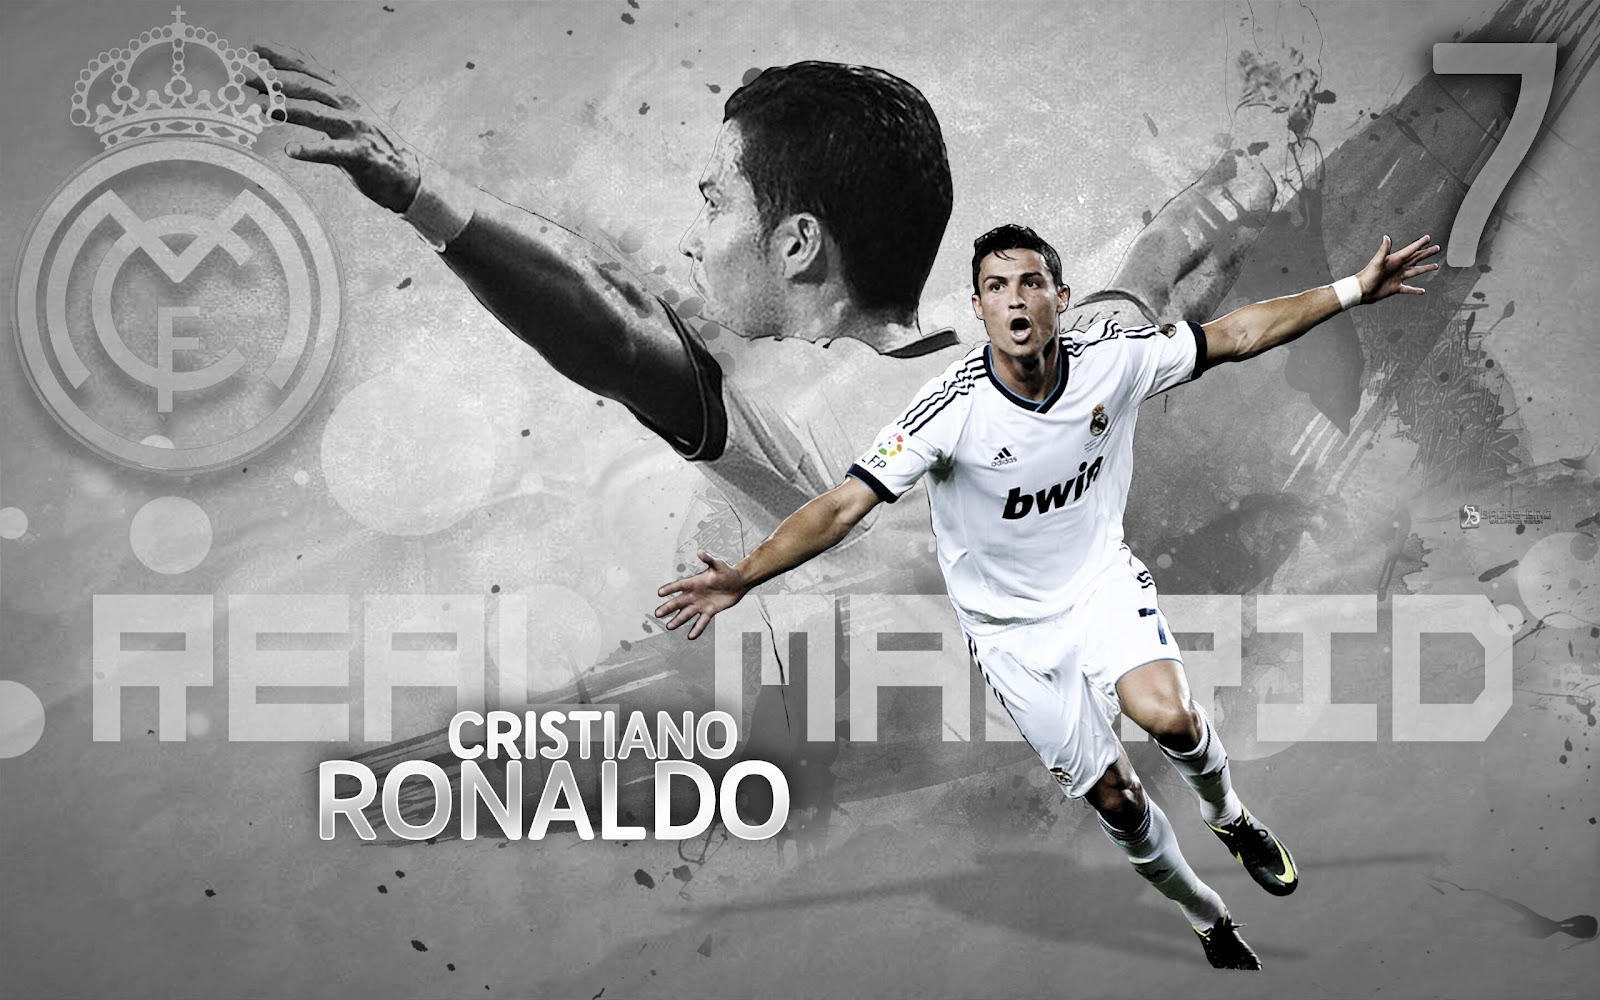 Cristiano Ronaldo HD Wallpapers   CR7 Best Photos Sporteology 1600x1000